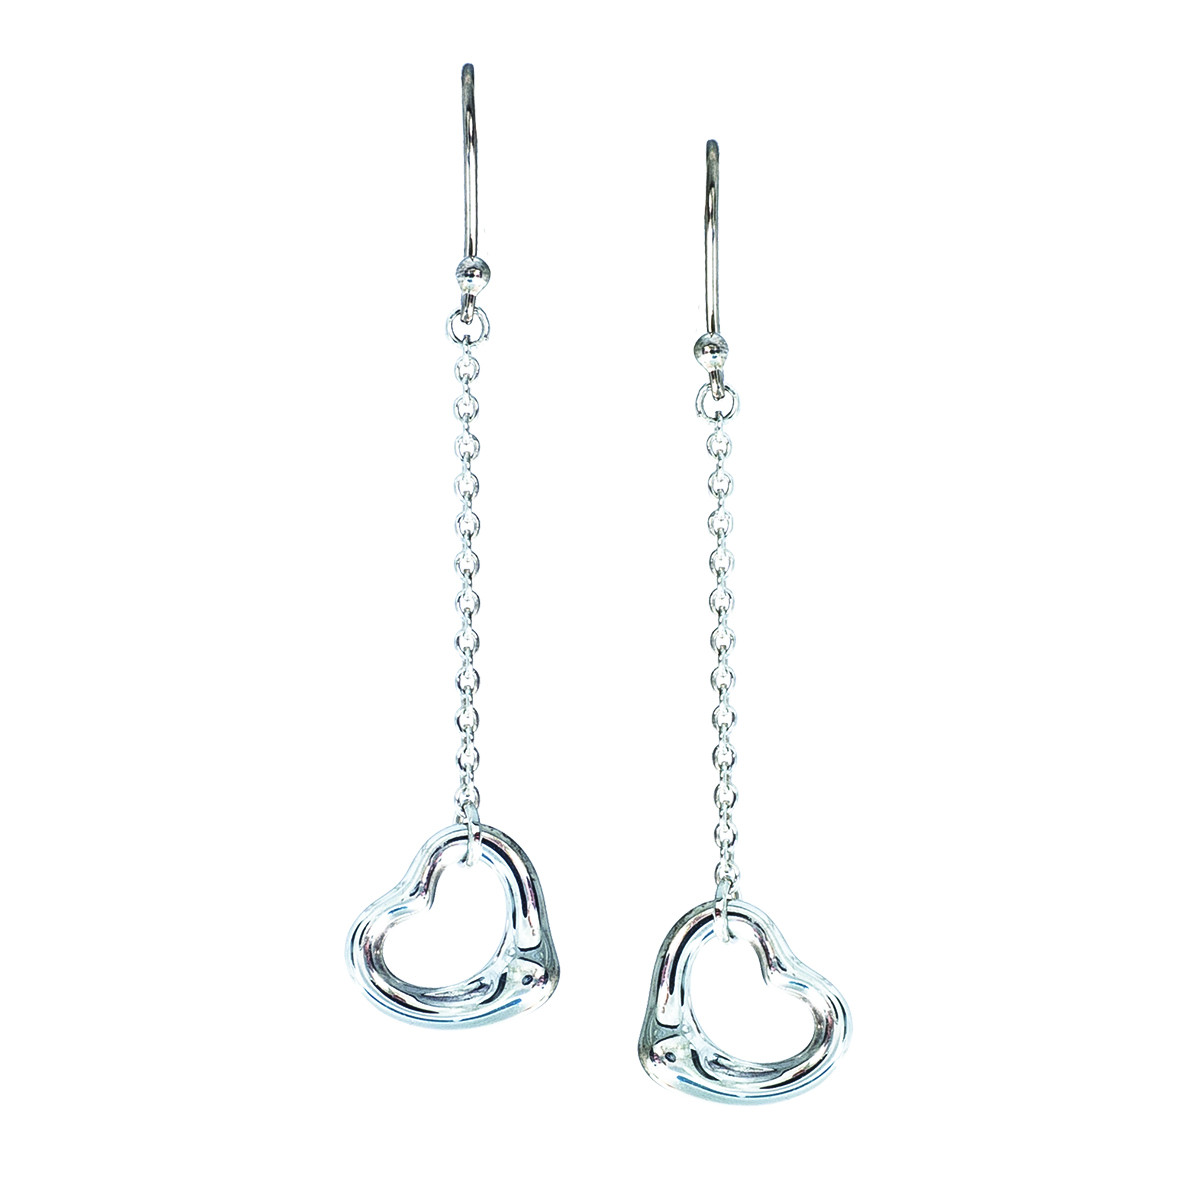 Vintage Tiffany & Co. Elsa Peretti Open Heart Dangle Earrings